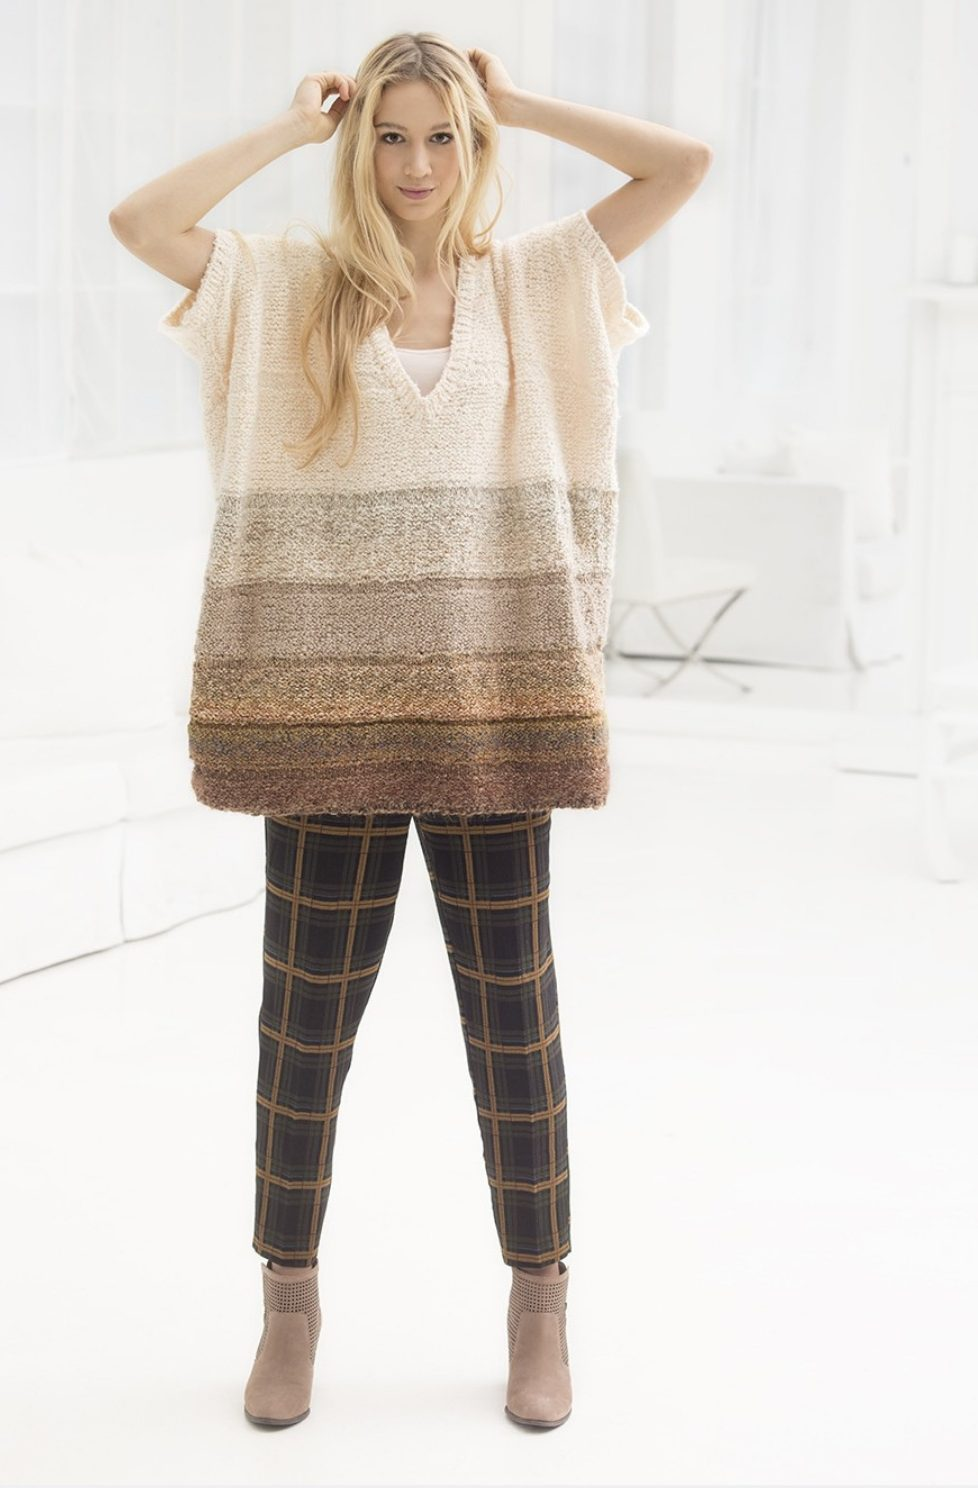 Neutral knits